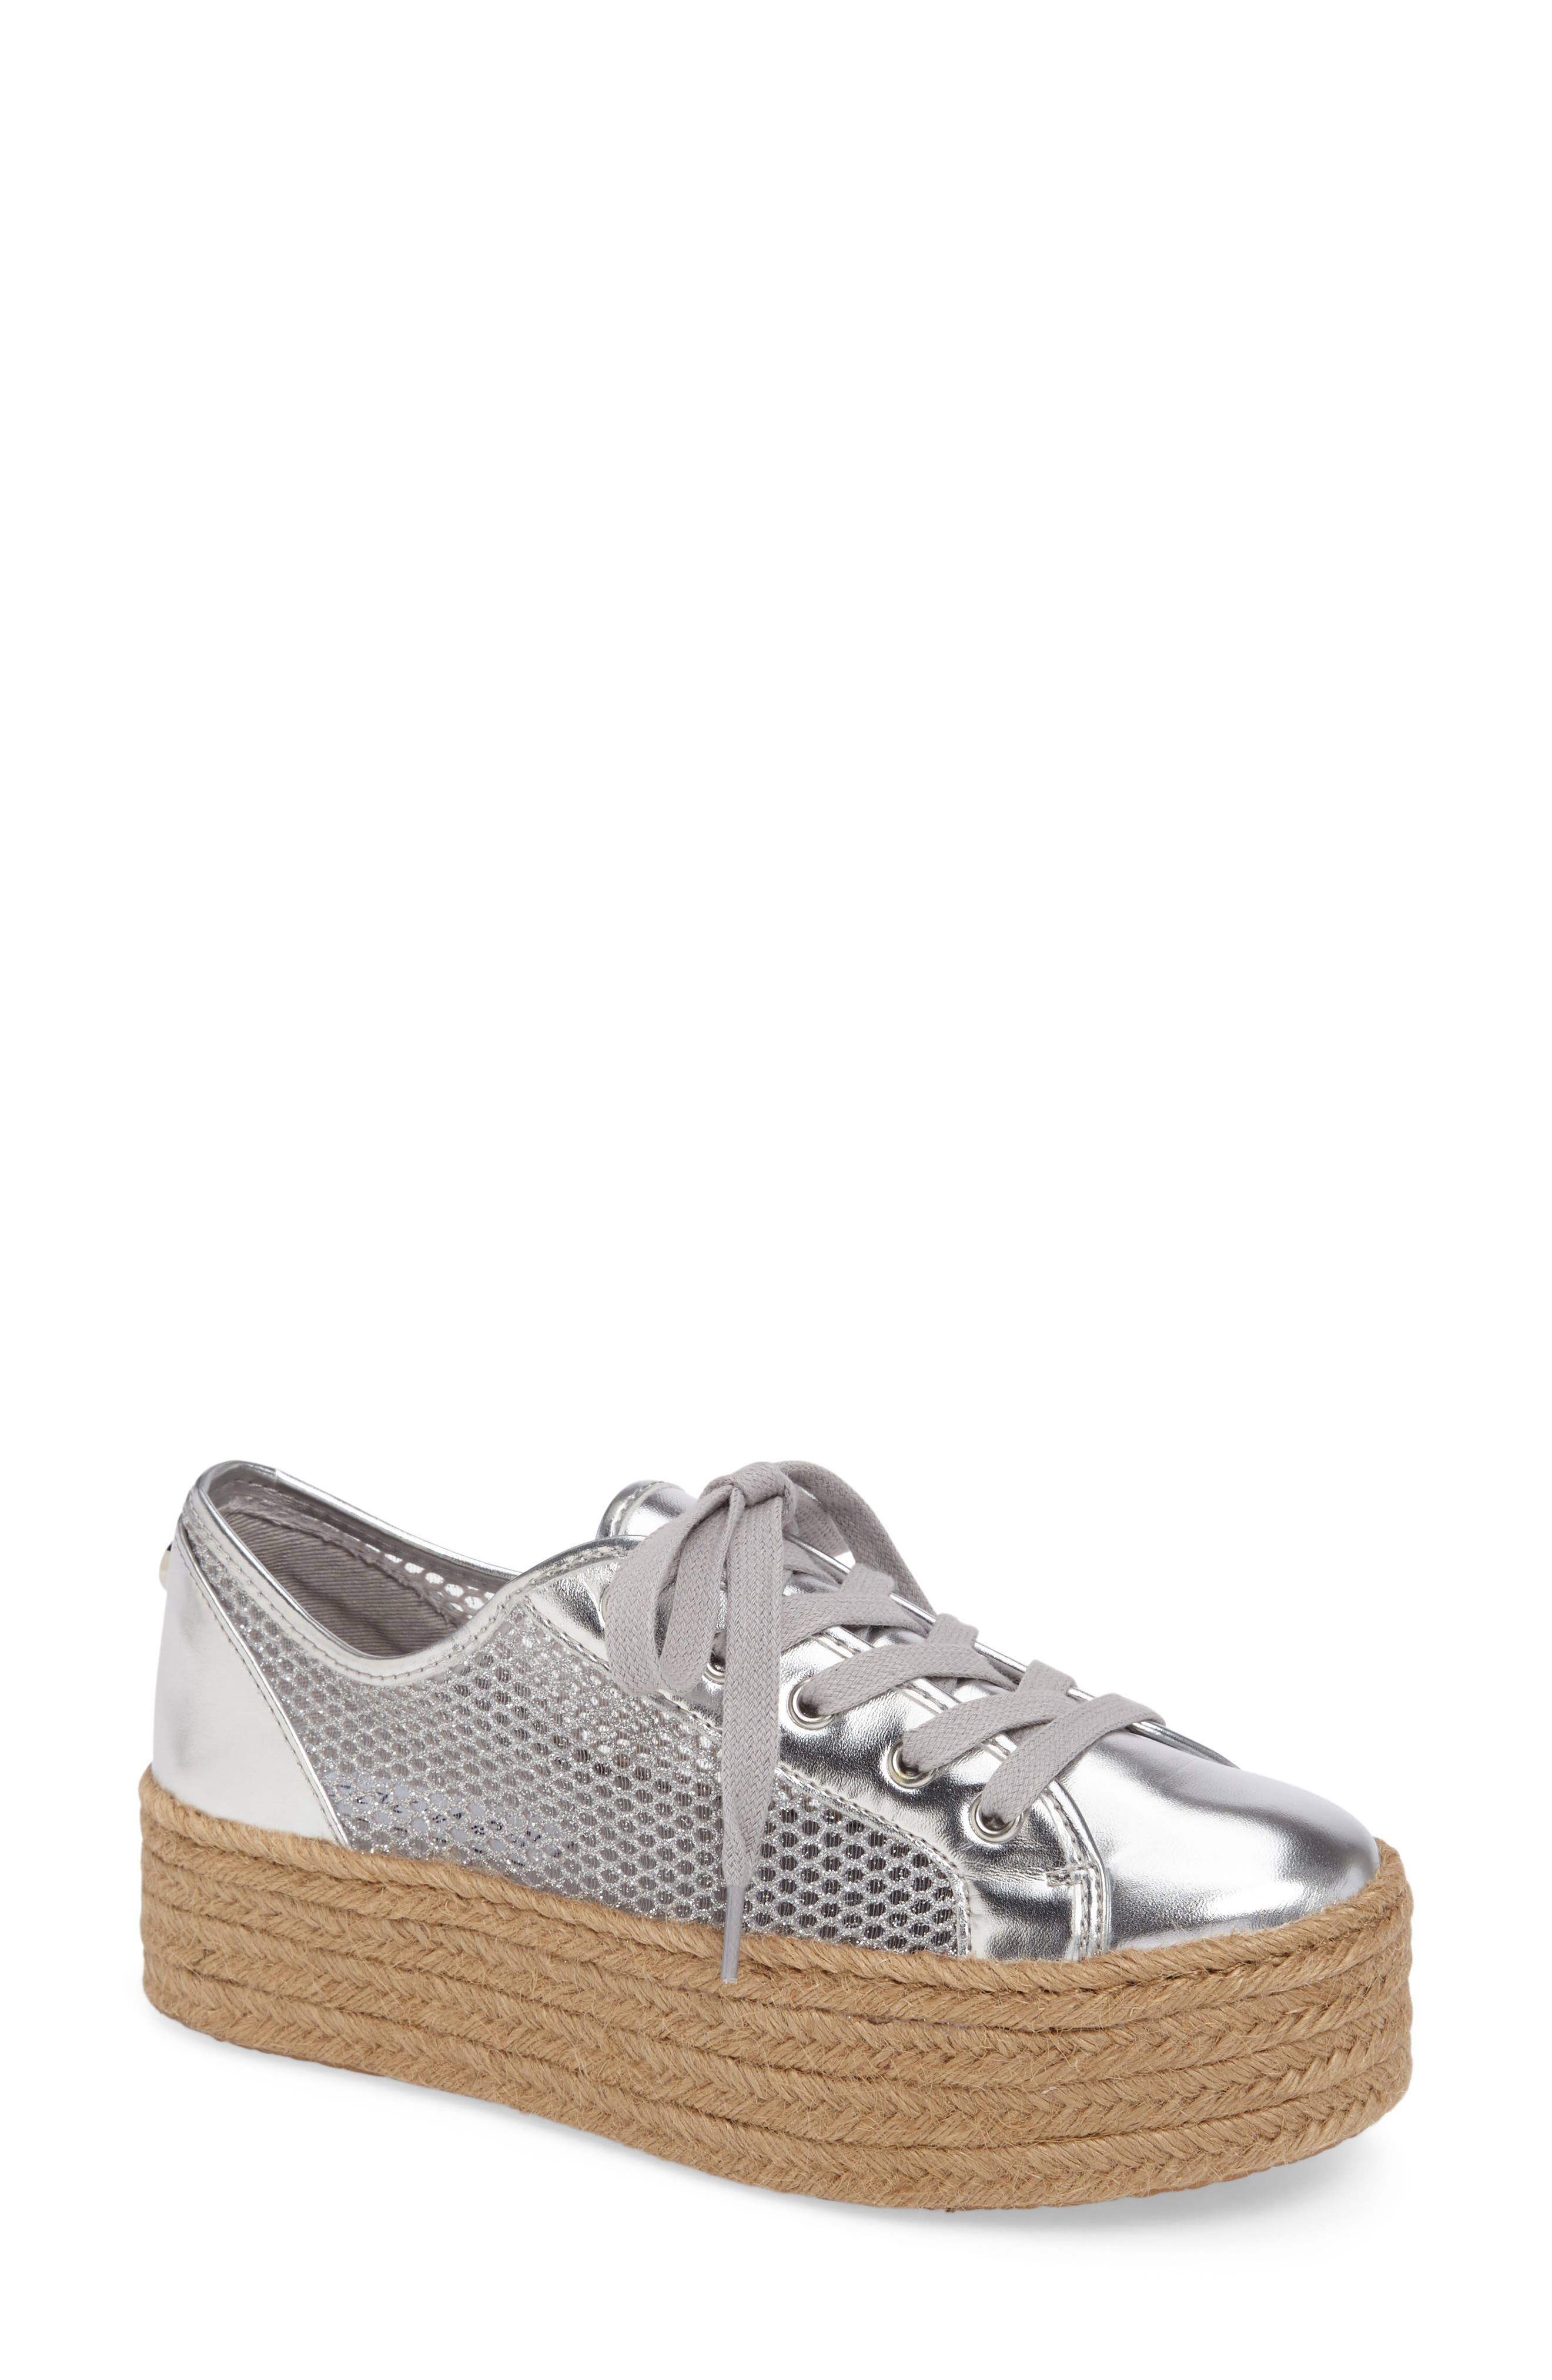 Mars Platform Sneaker,                             Main thumbnail 1, color,                             Silver